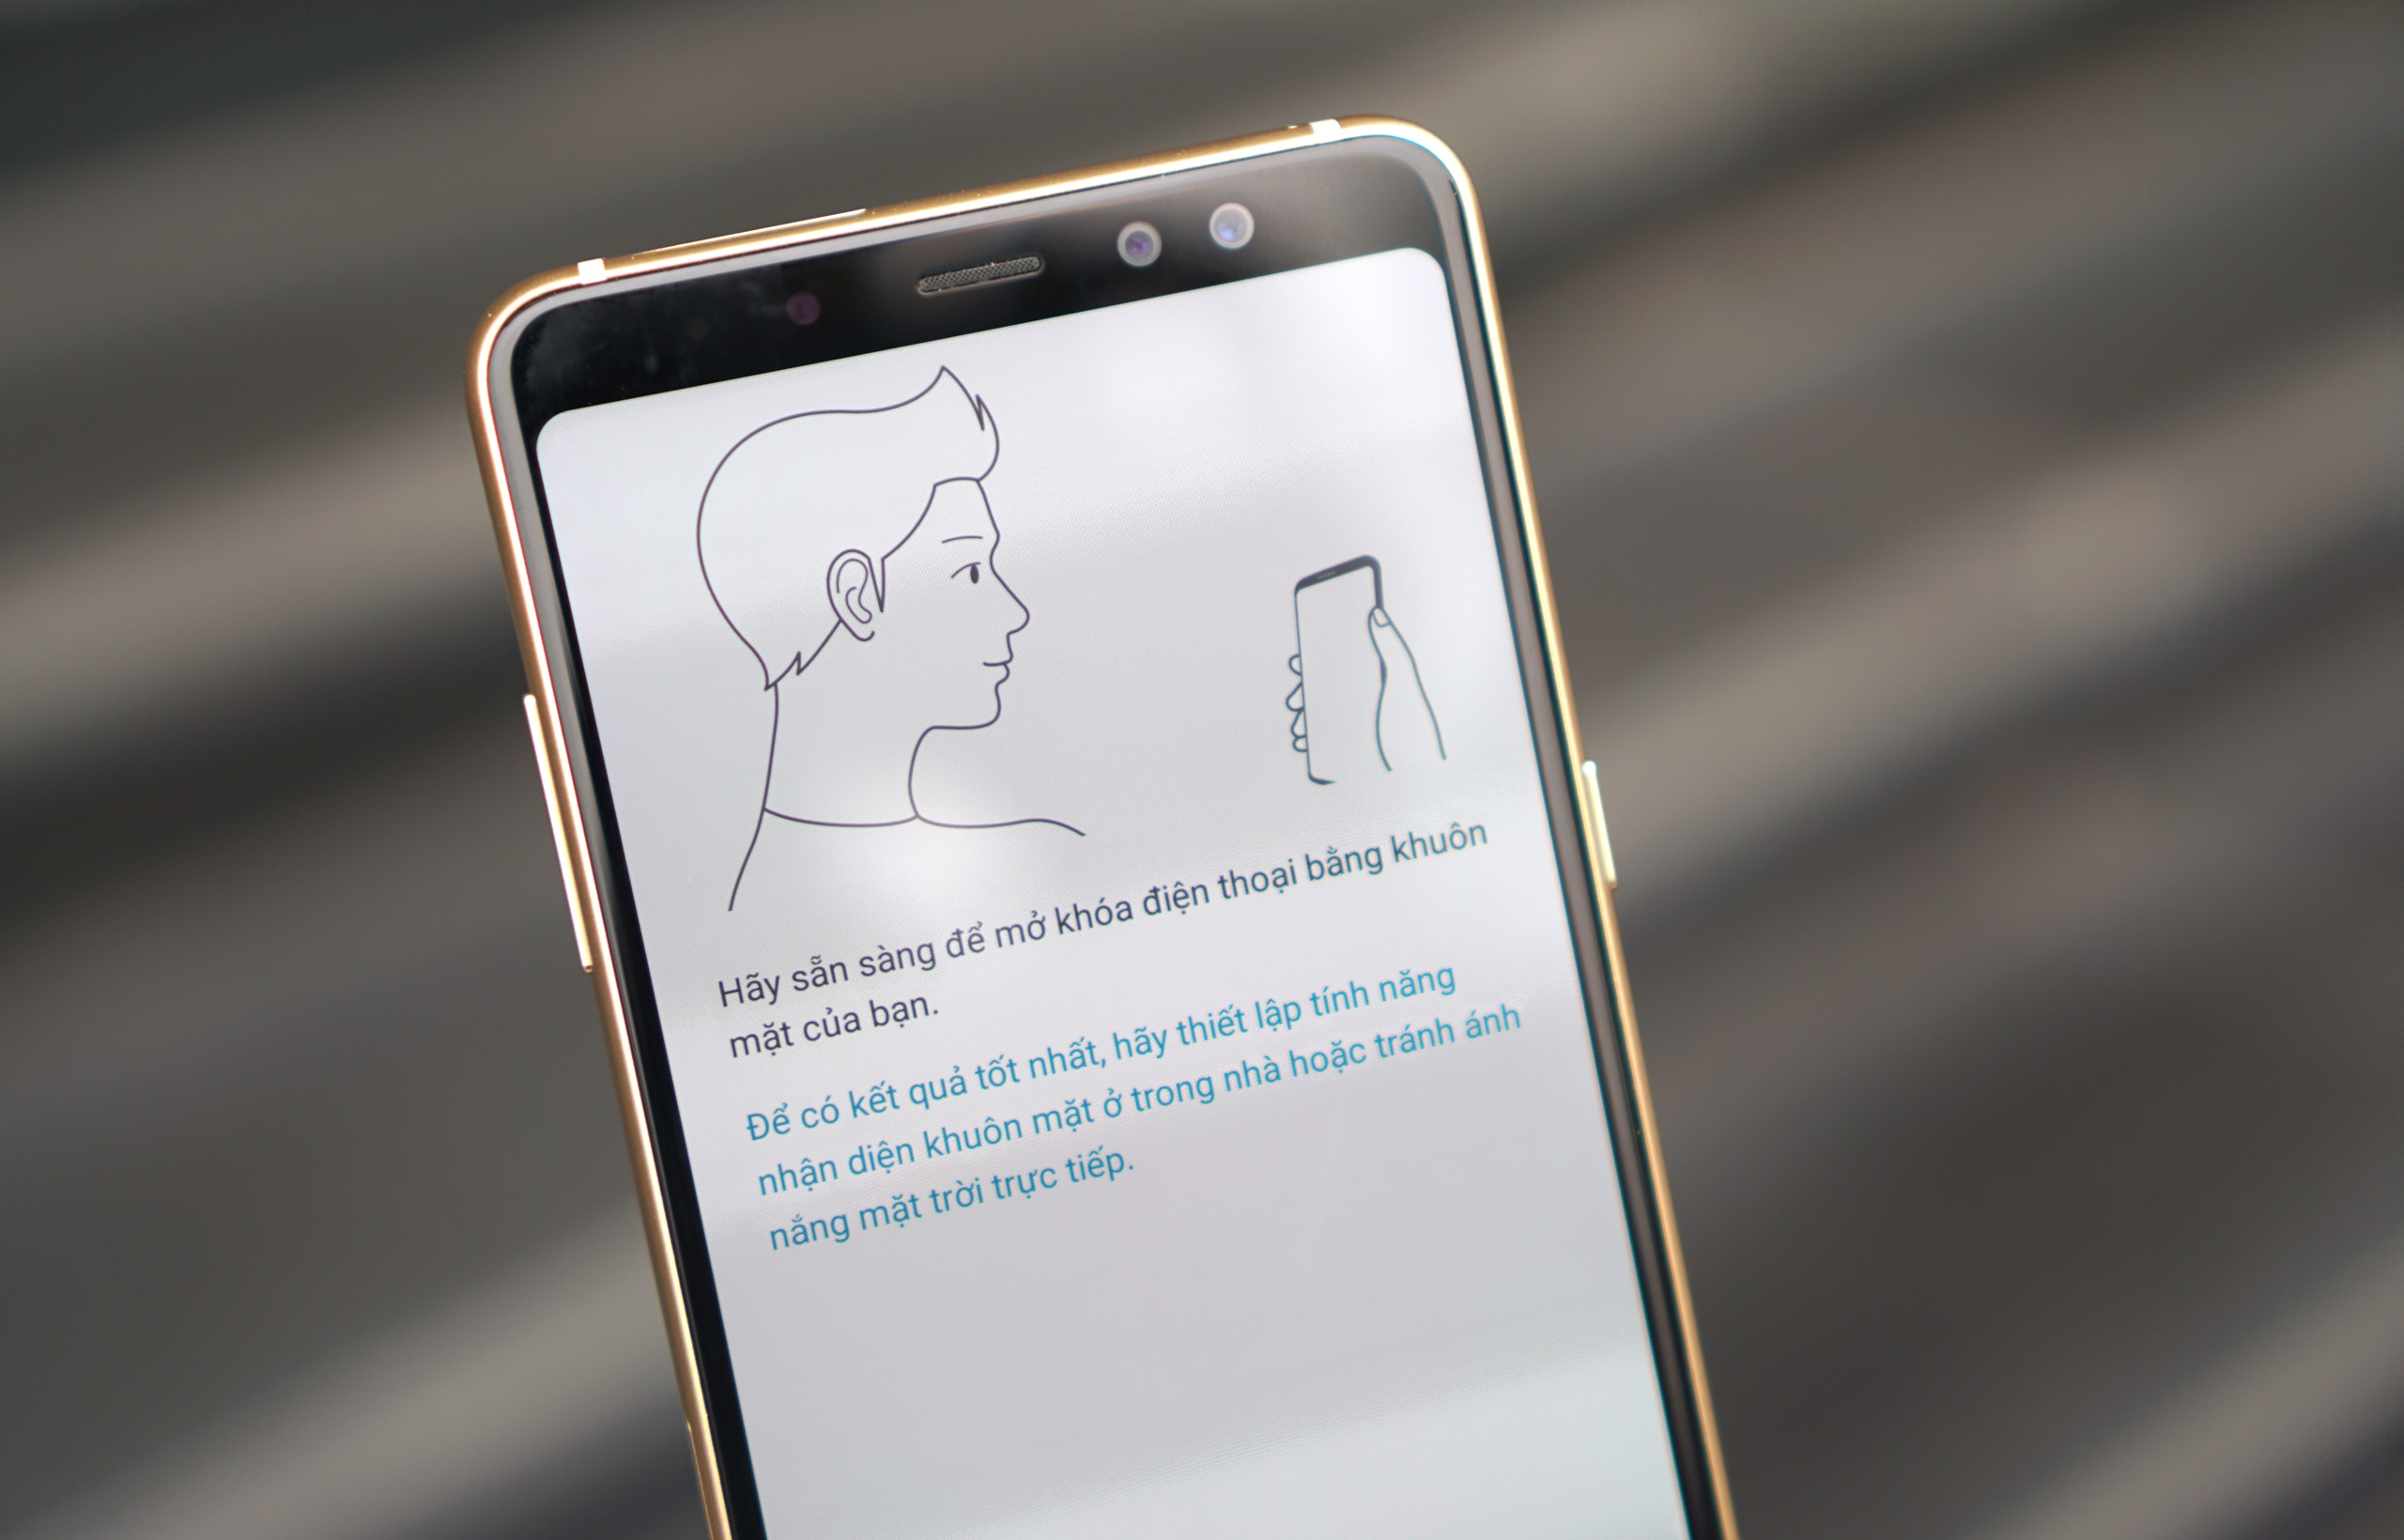 Vi sao Galaxy A8/A8+ la lua chon noi bat cho nguoi dung tre? hinh anh 16